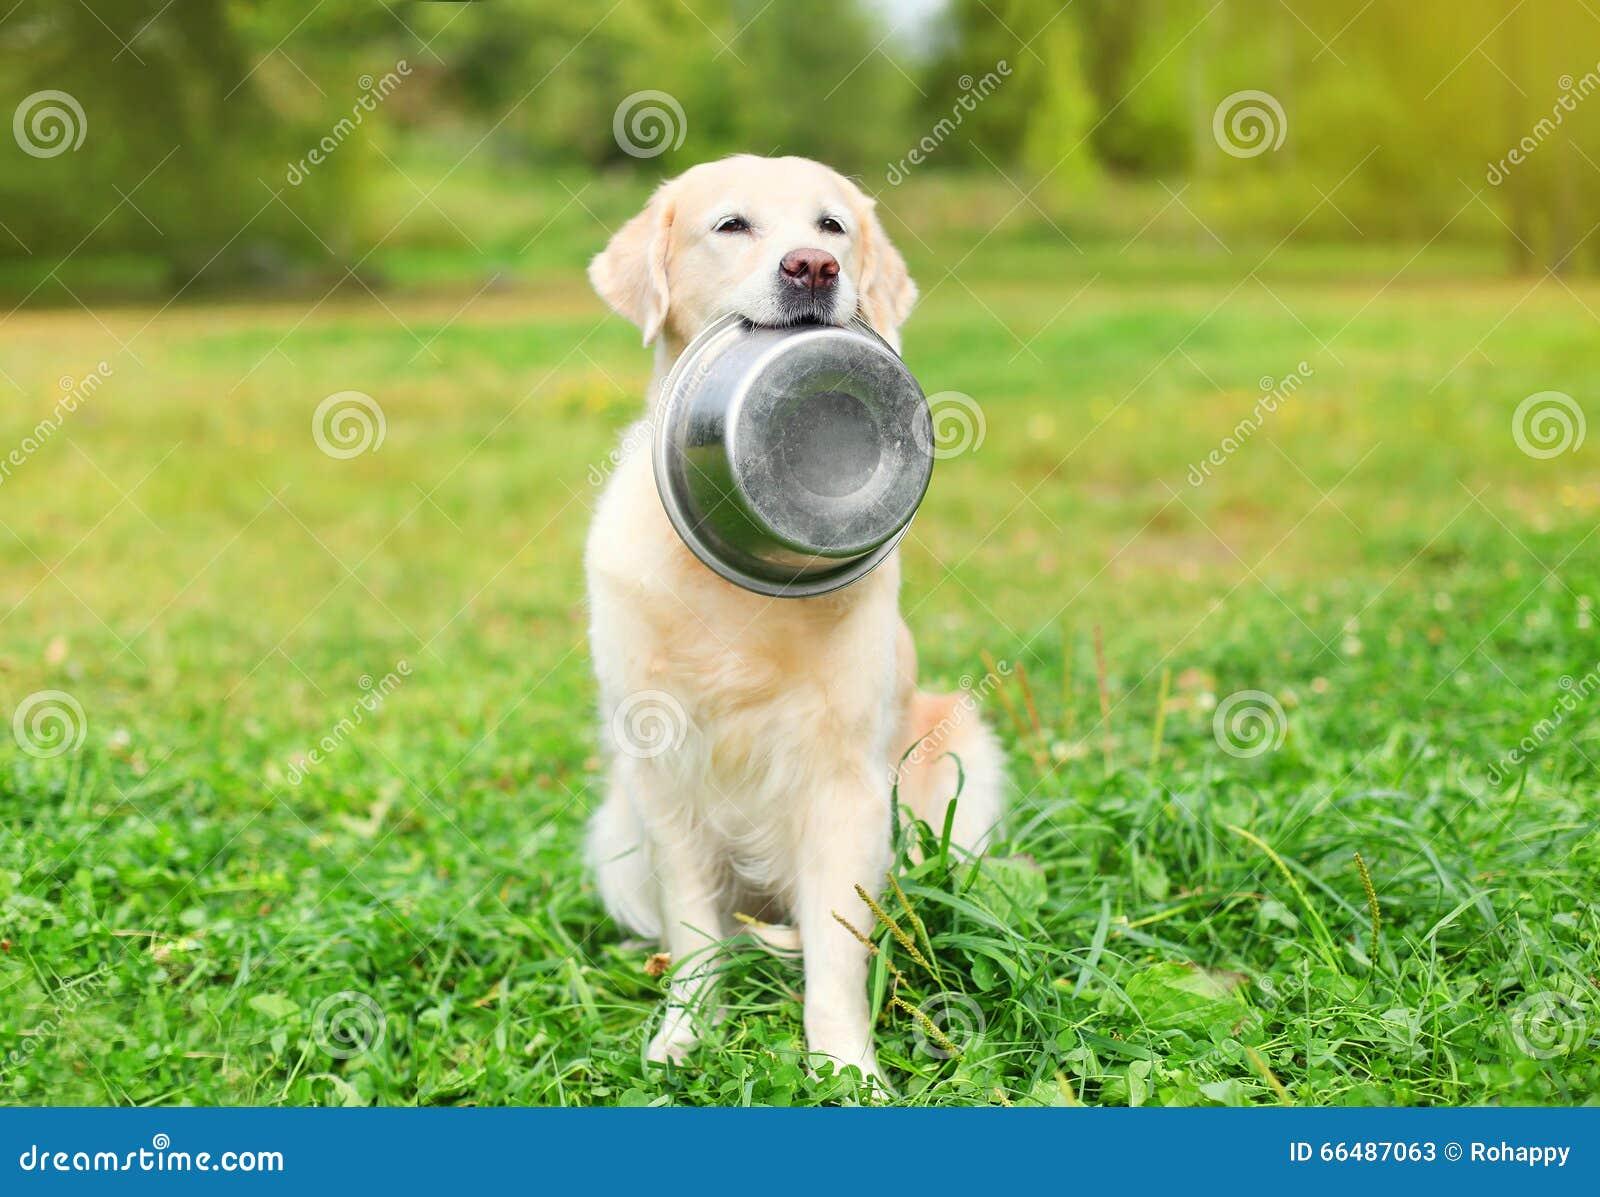 Beautiful Golden Retriever dog holding in teeth bowl on grass